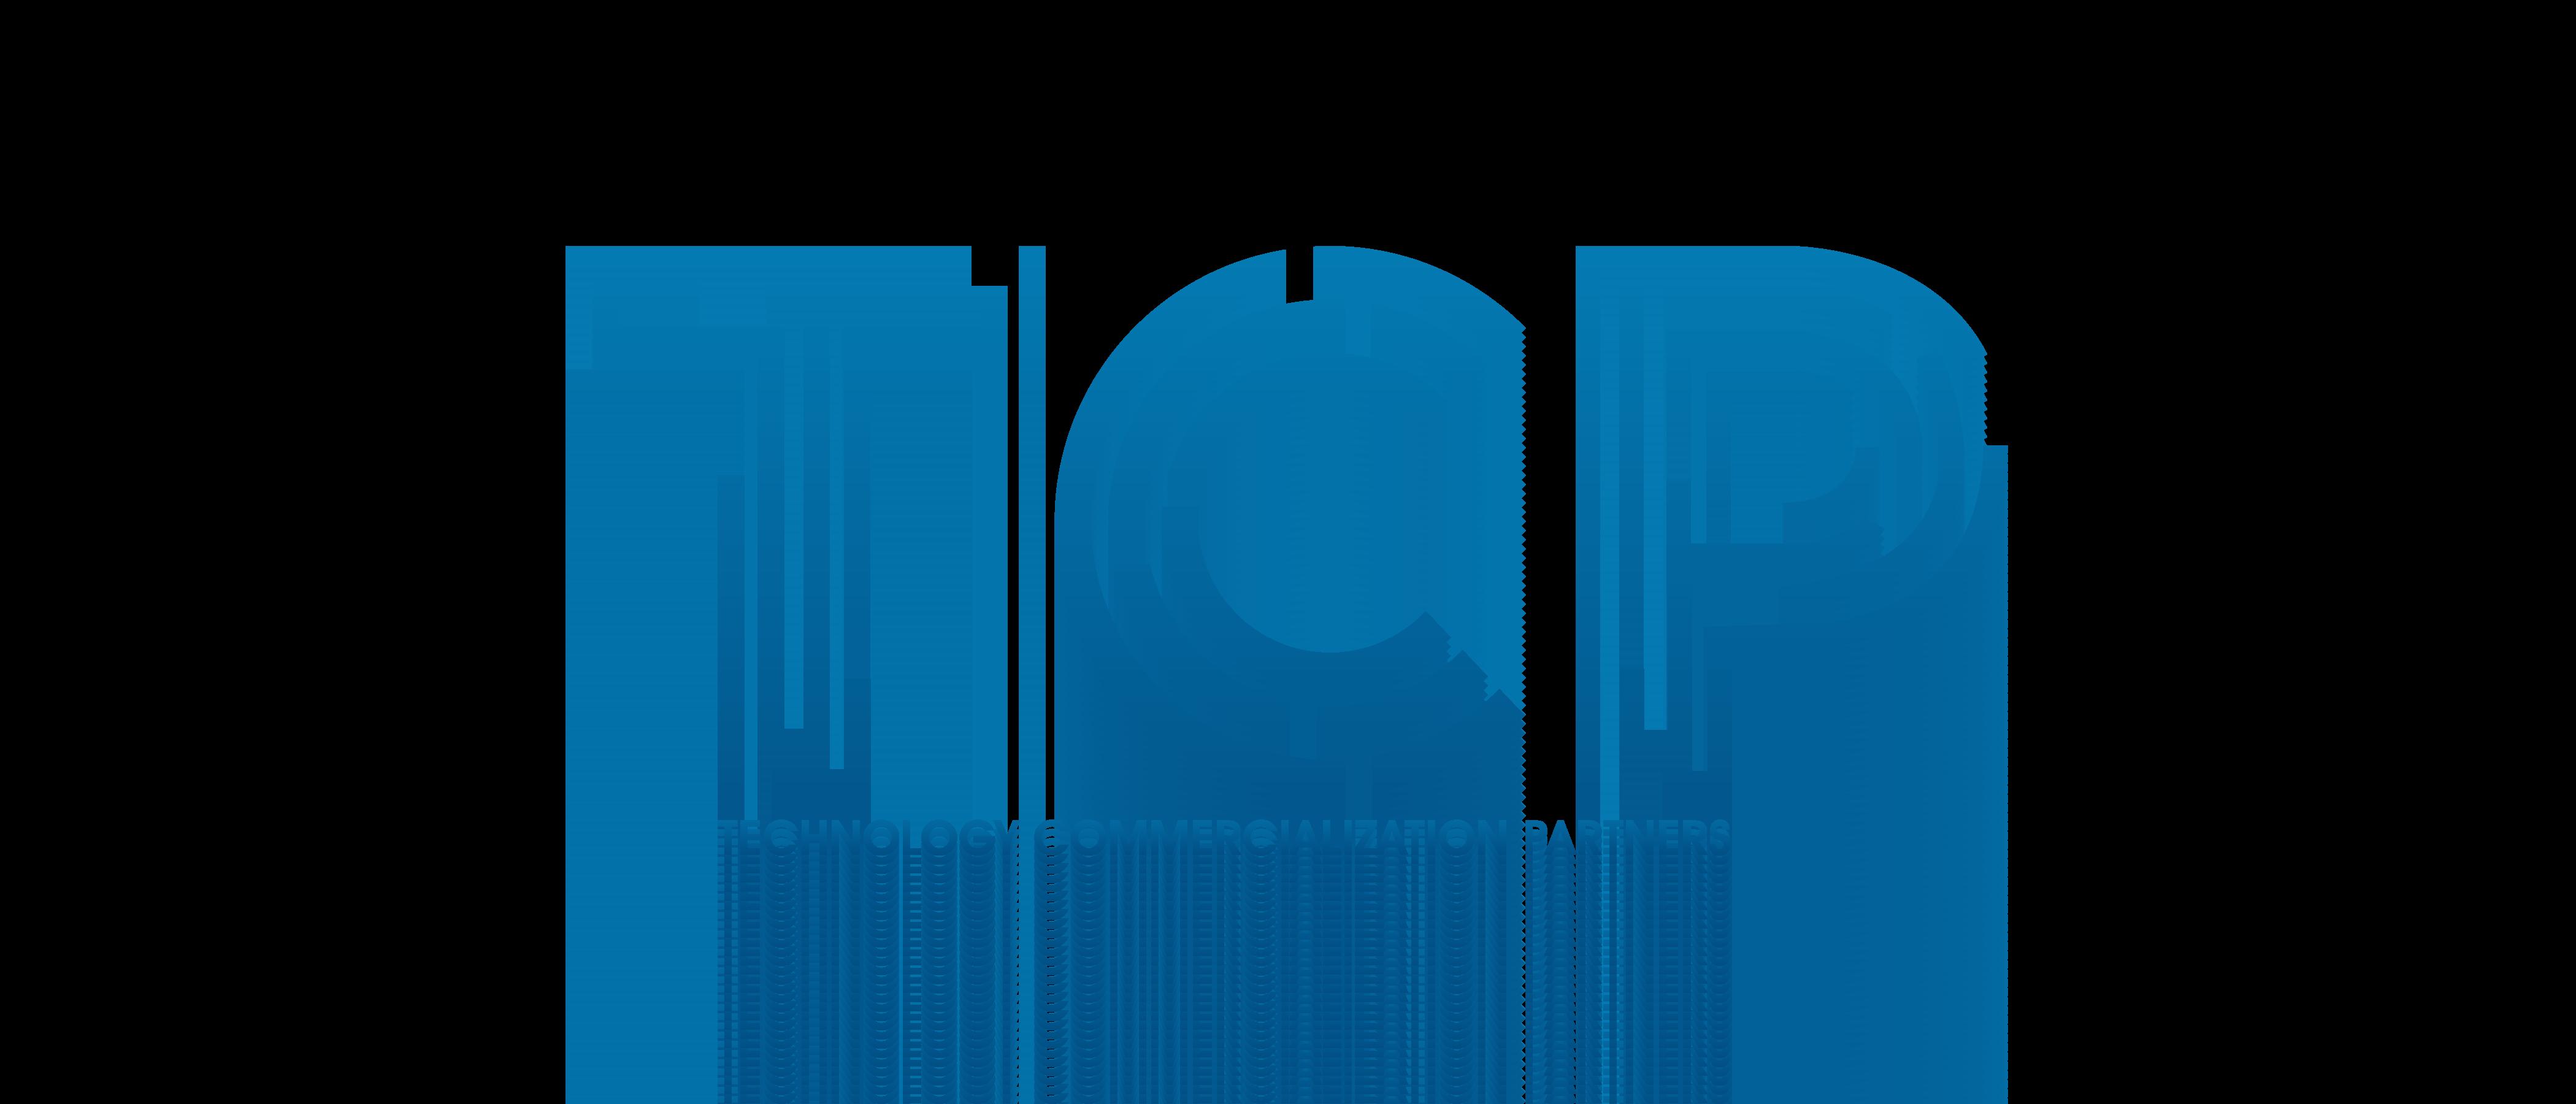 Technology Commercialization Partners